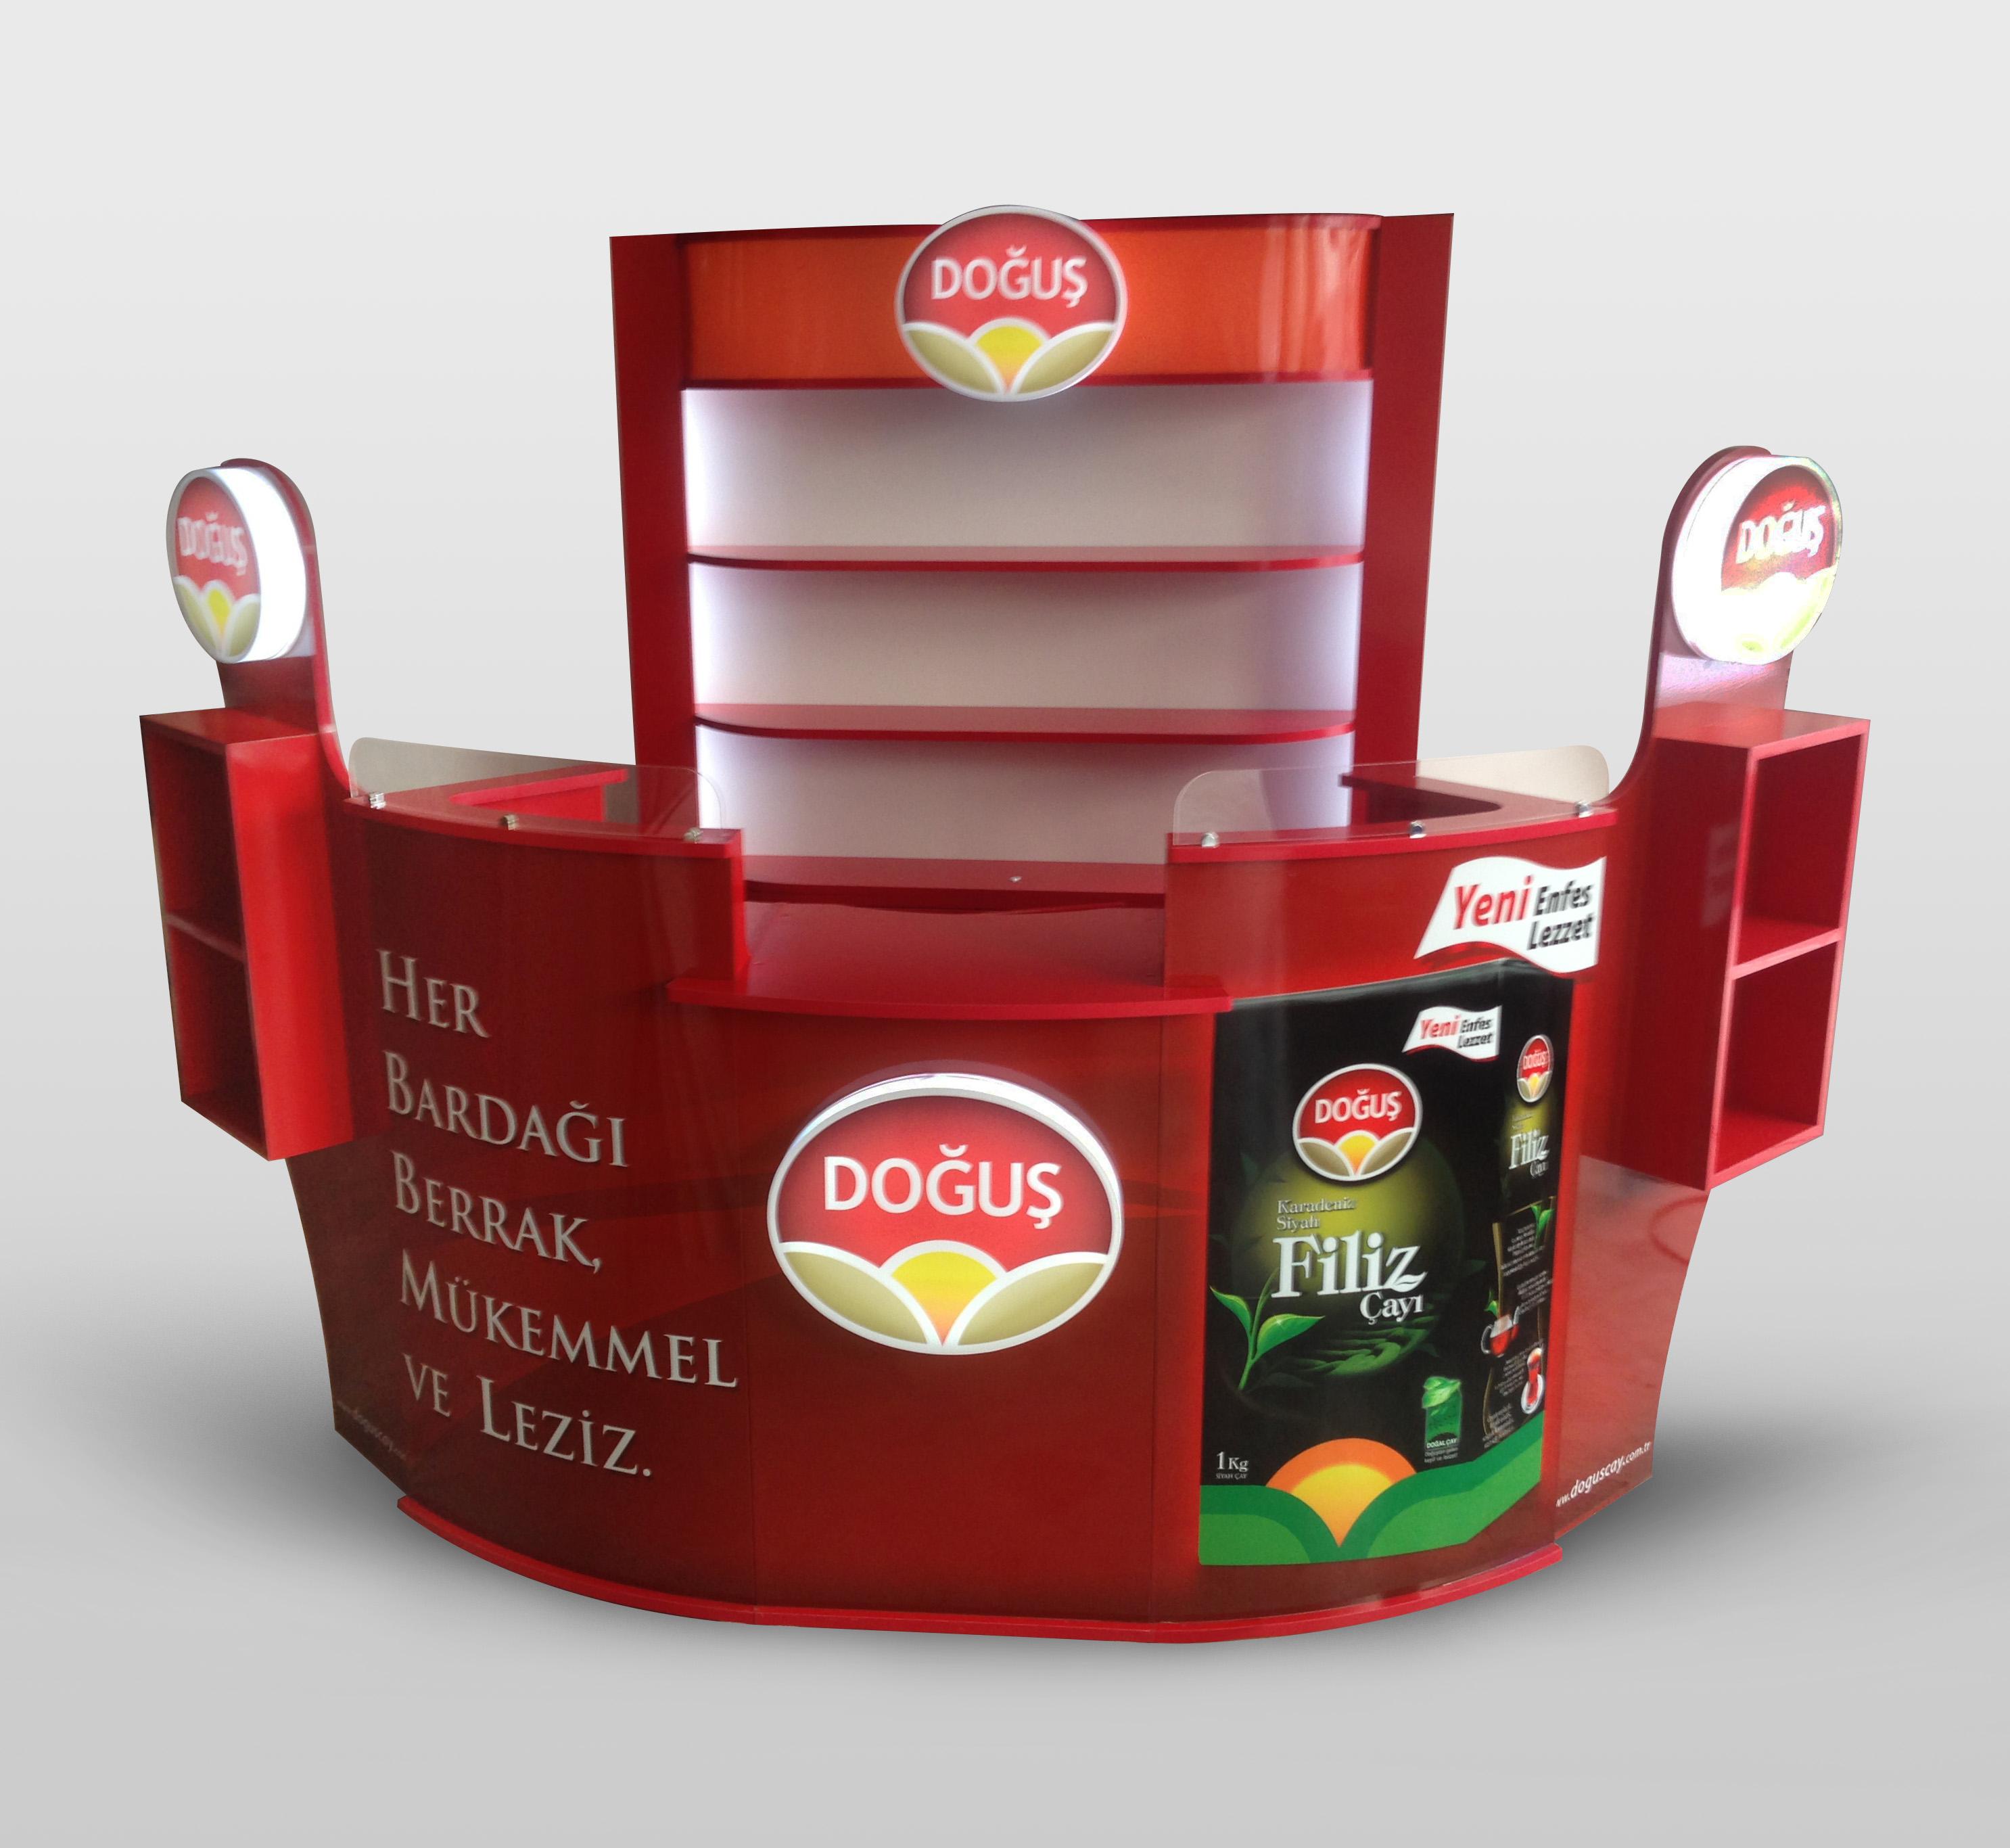 DOGUS ÇAY Reklam Standi Nitro Tasarim tarafindan Üretildi.